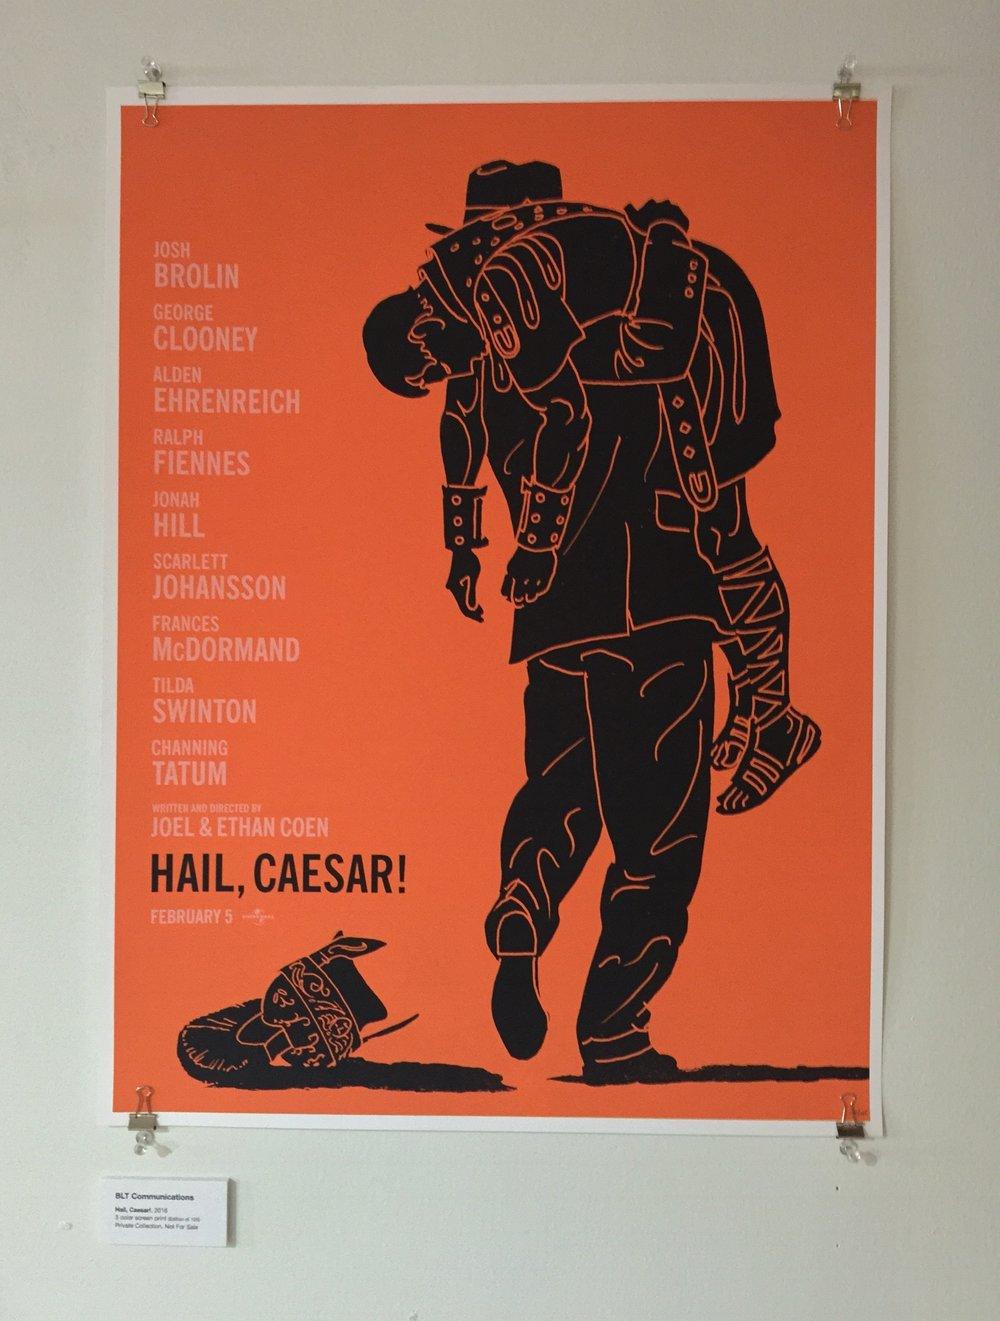 Hail, Caesar! by BLT Communications